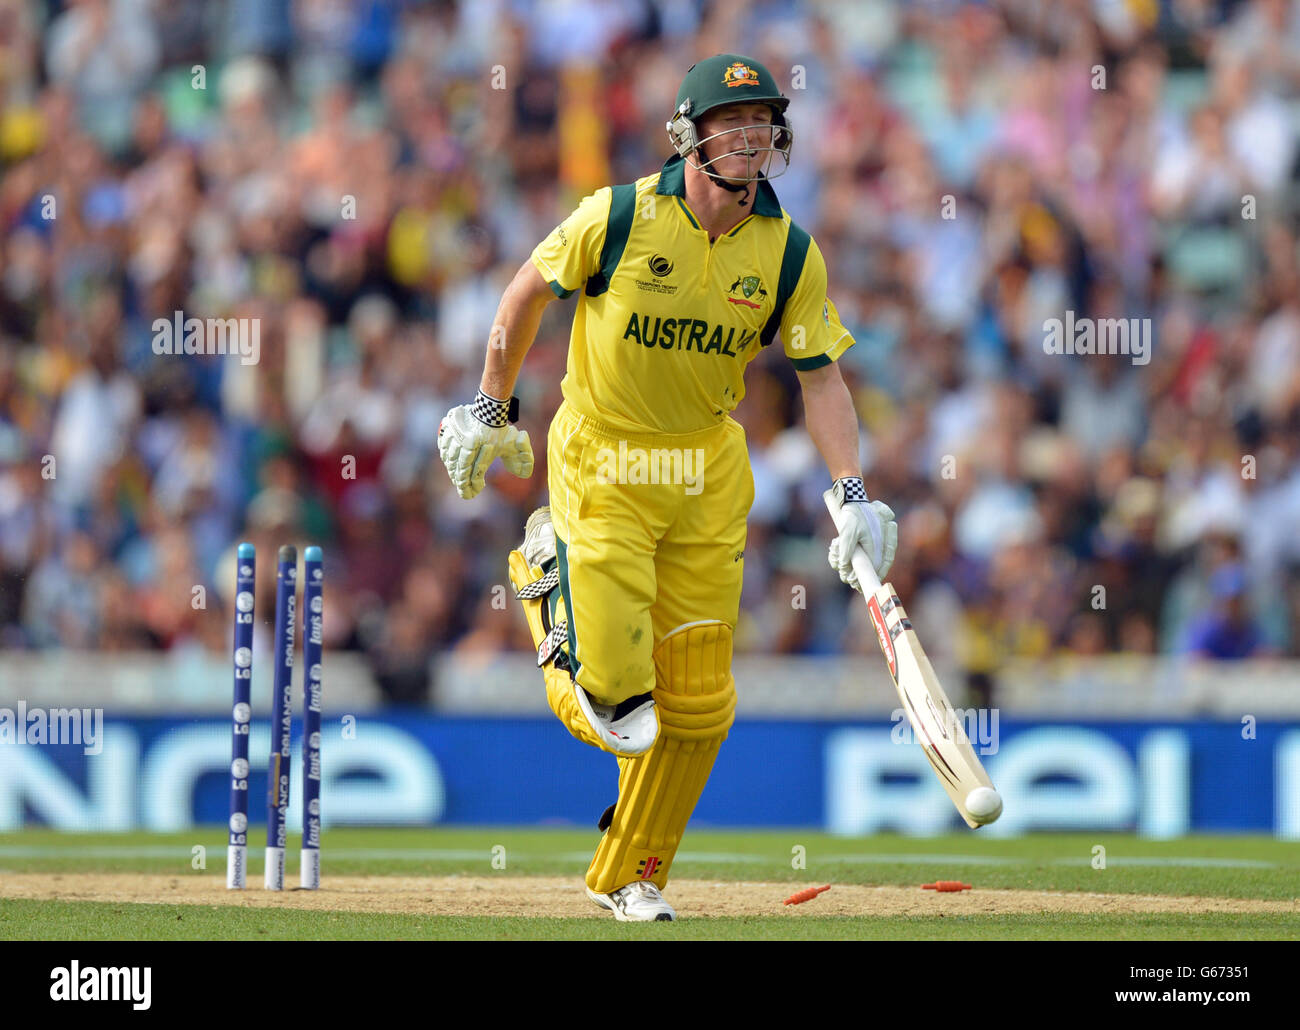 Cricket Icc Champions Trophy Group A Australia V Sri